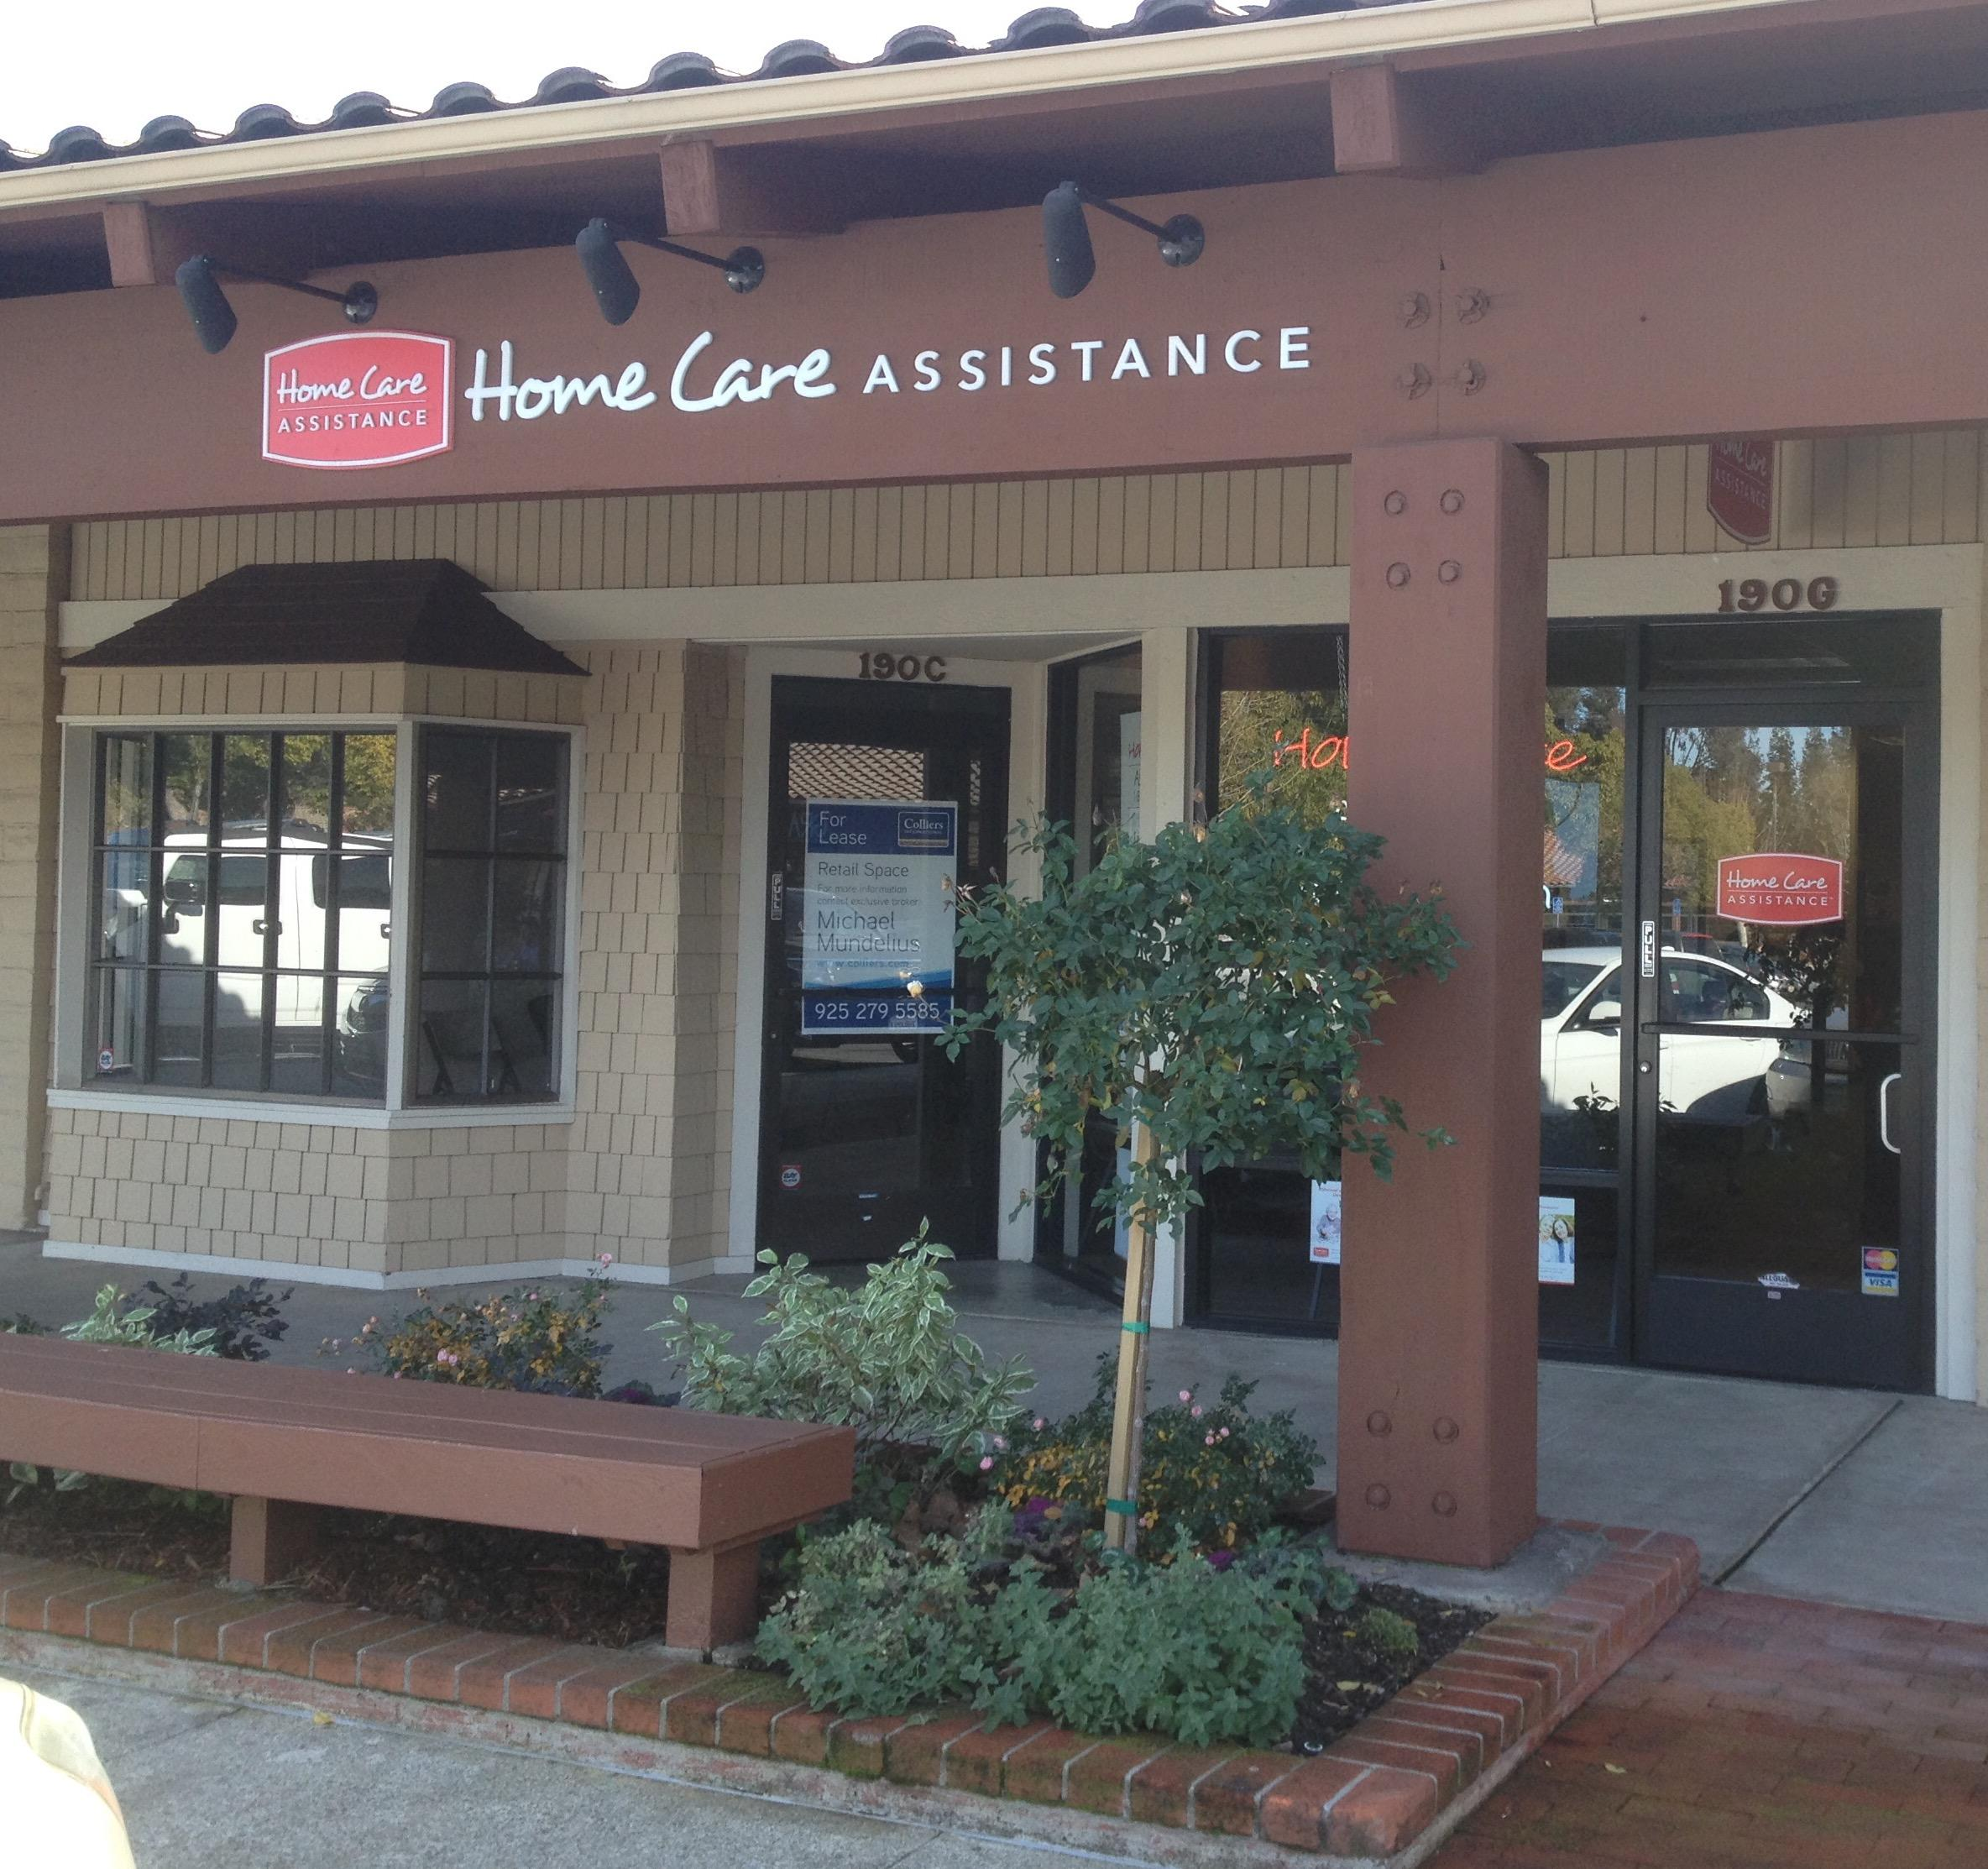 Home Care Assistance - Alamo Senior Care image 0